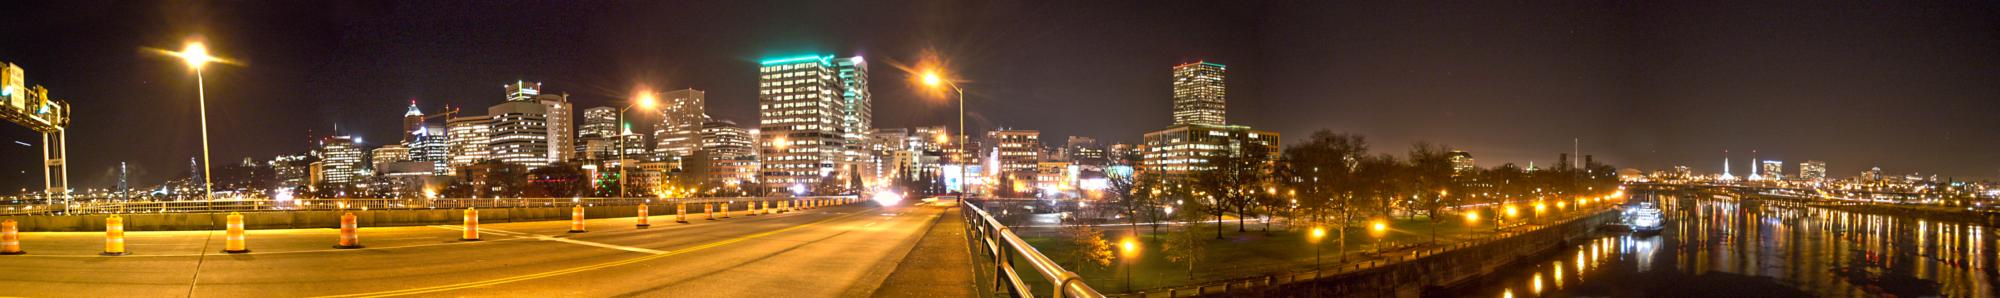 Portland skyline downtown showing Morrison bridge